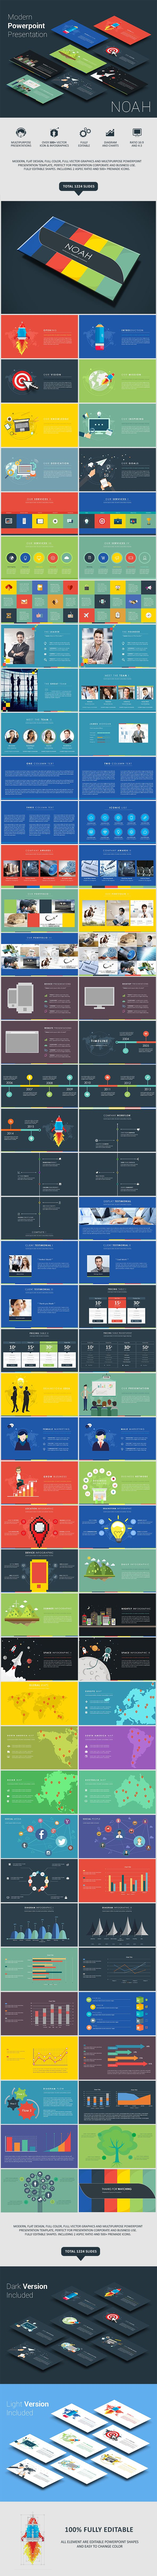 NOAH - Multipurpose Powerpoint Presentations (PowerPoint Templates)